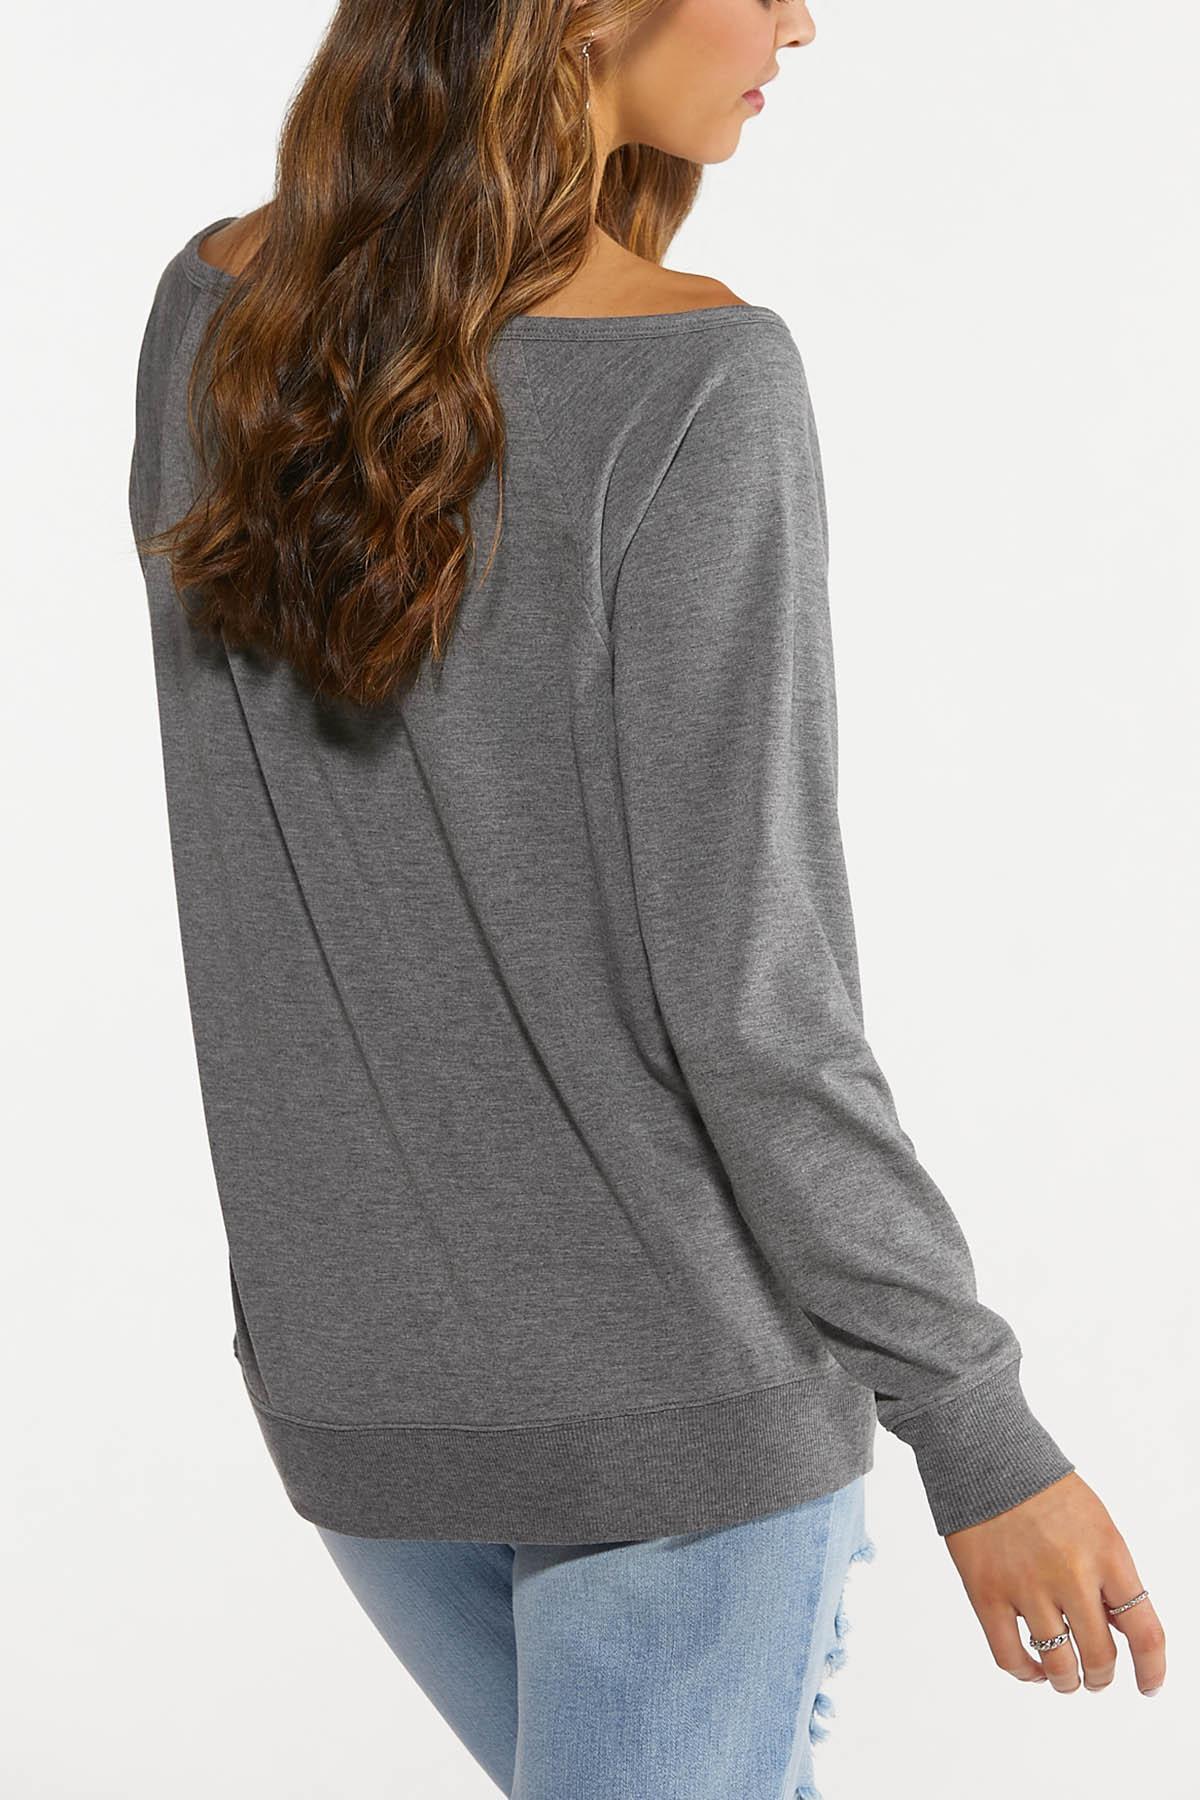 Plus Size Slouch Football Sweatshirt (Item #44688103)